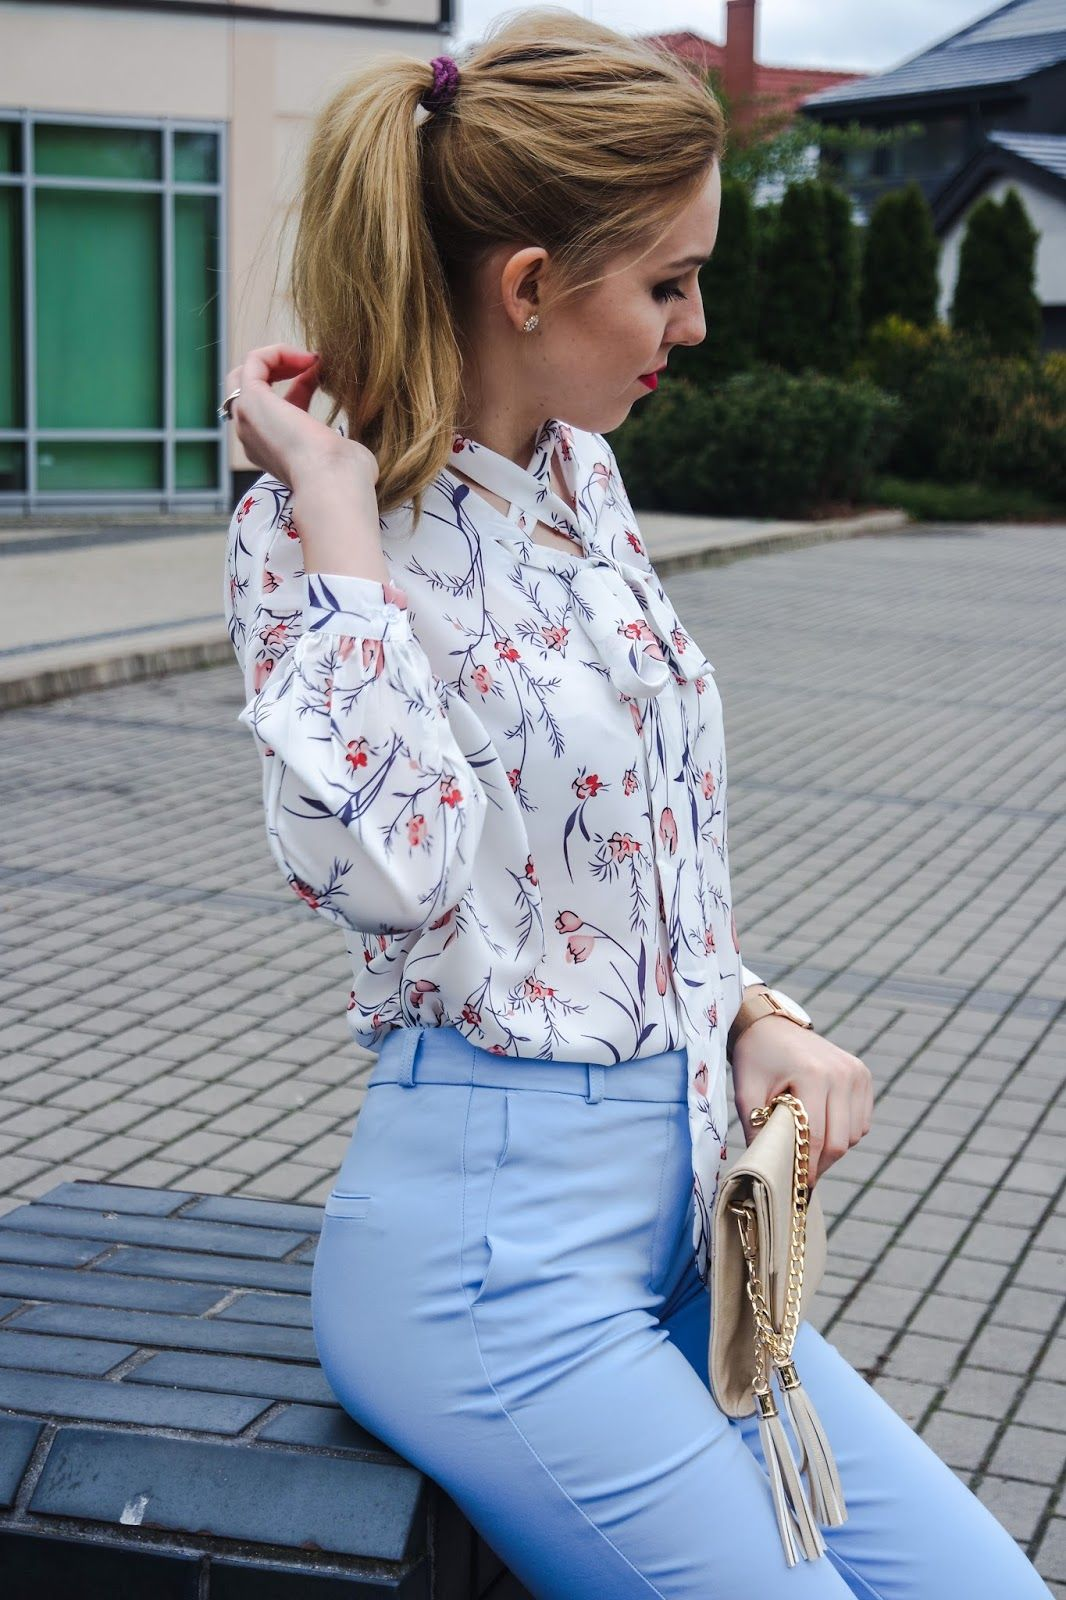 Cygaretki Koszula Stylizacje Elegancja Long Sleeve Blouse Fashion Women S Top